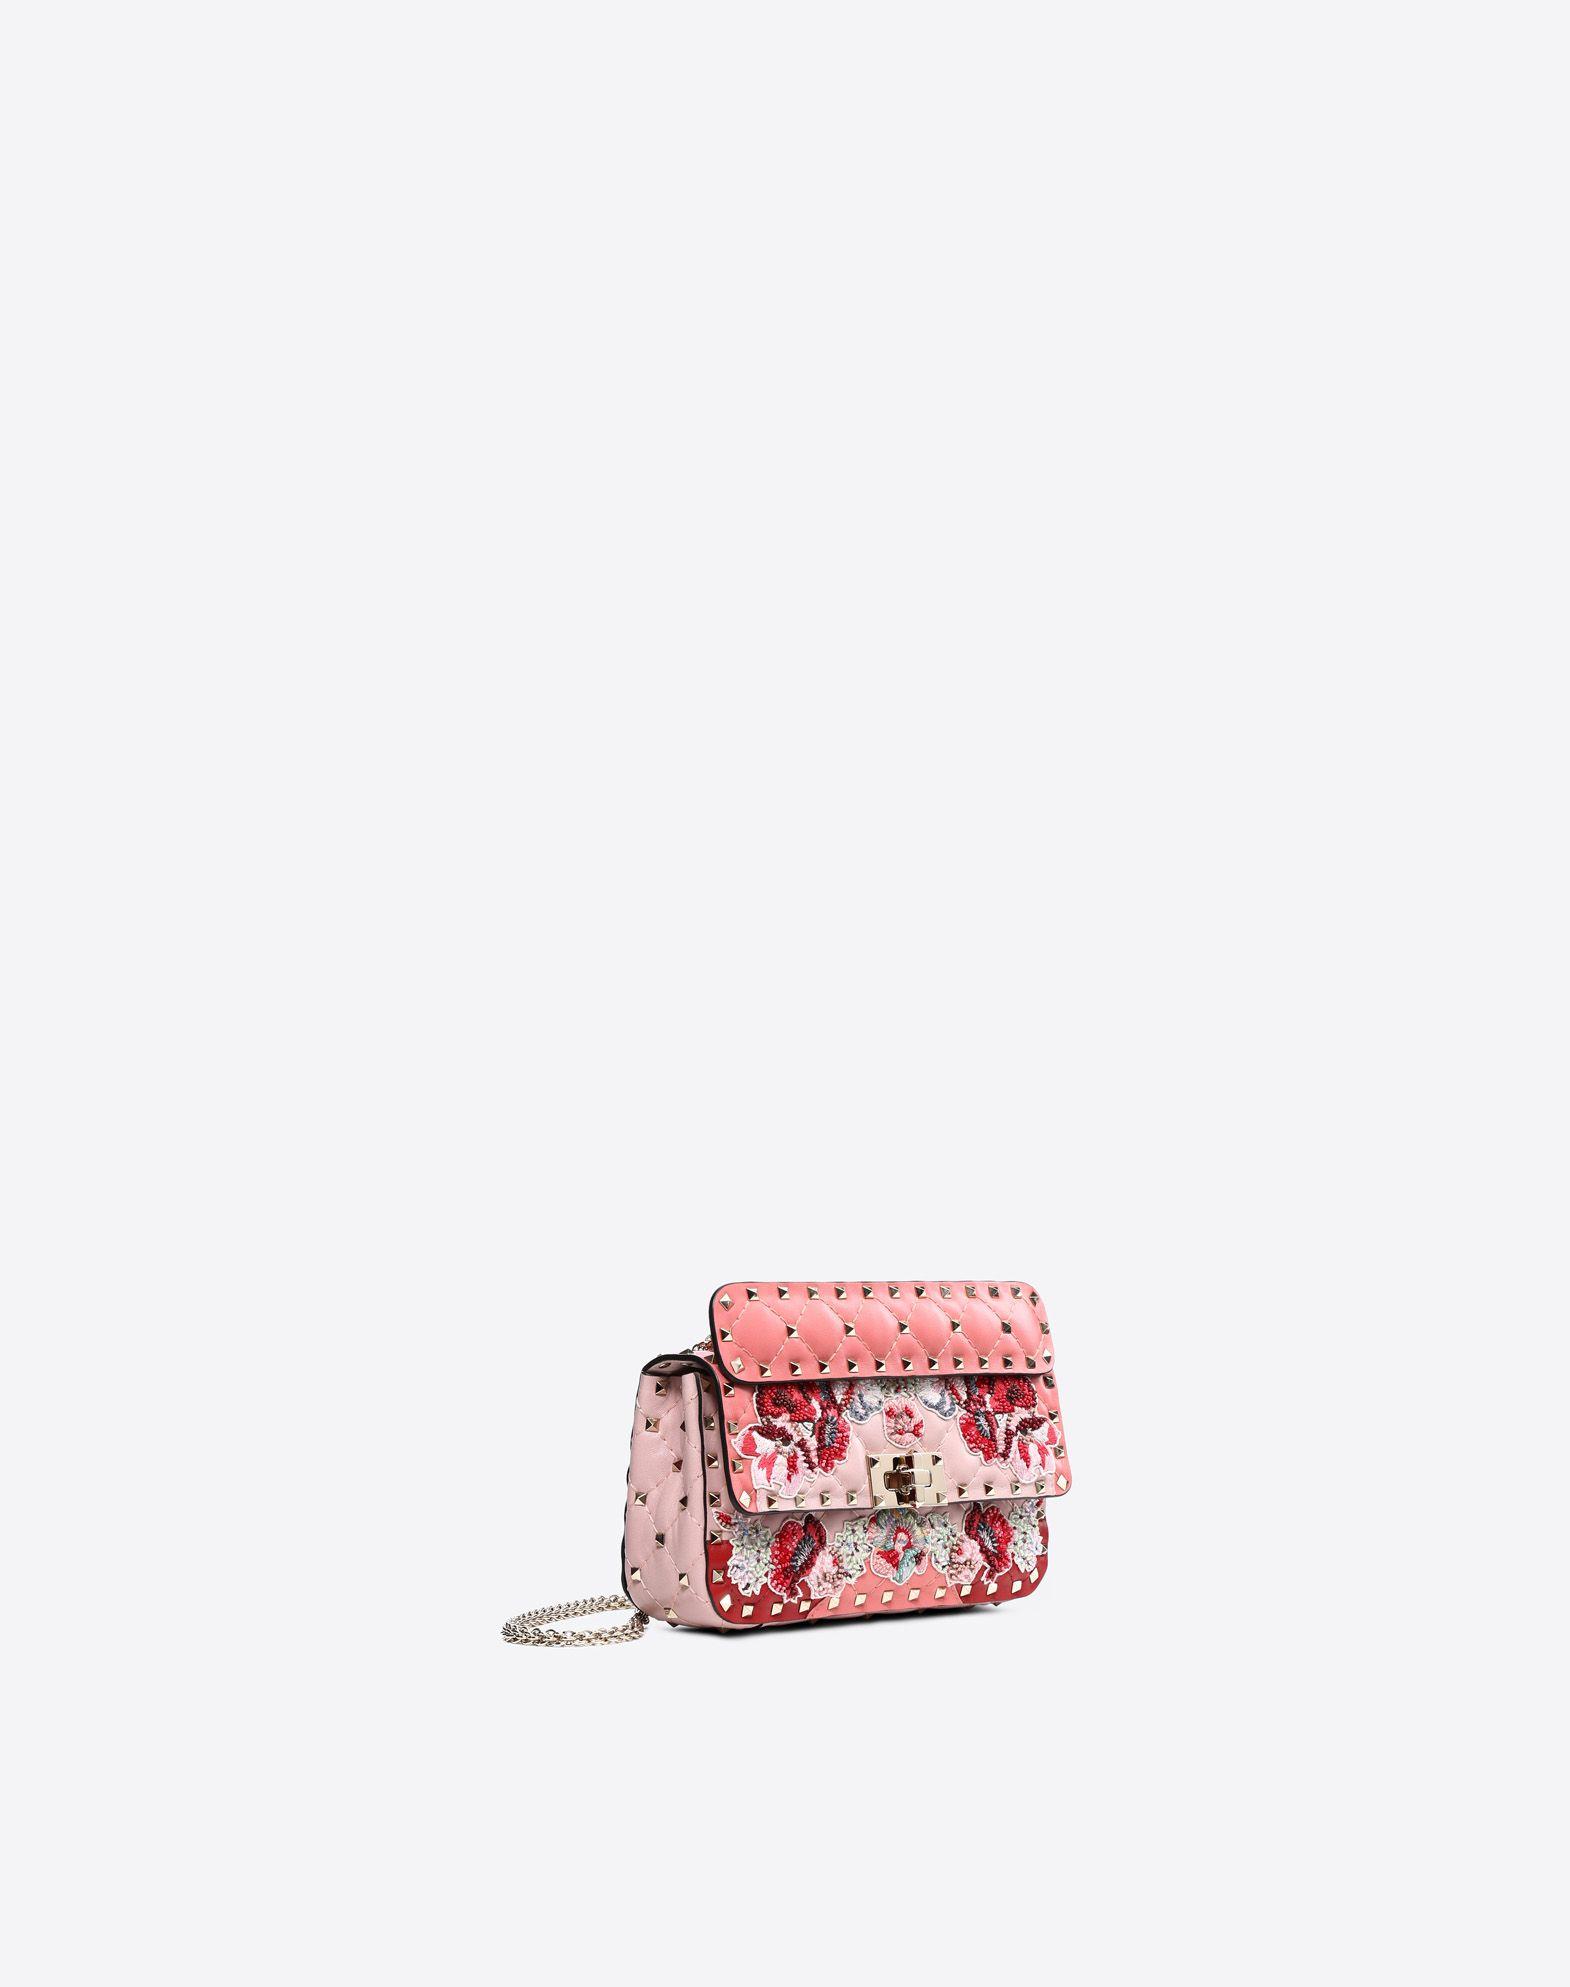 VALENTINO GARAVANI Rockstud Spike.It Small Chain Bag Shoulder bag D r